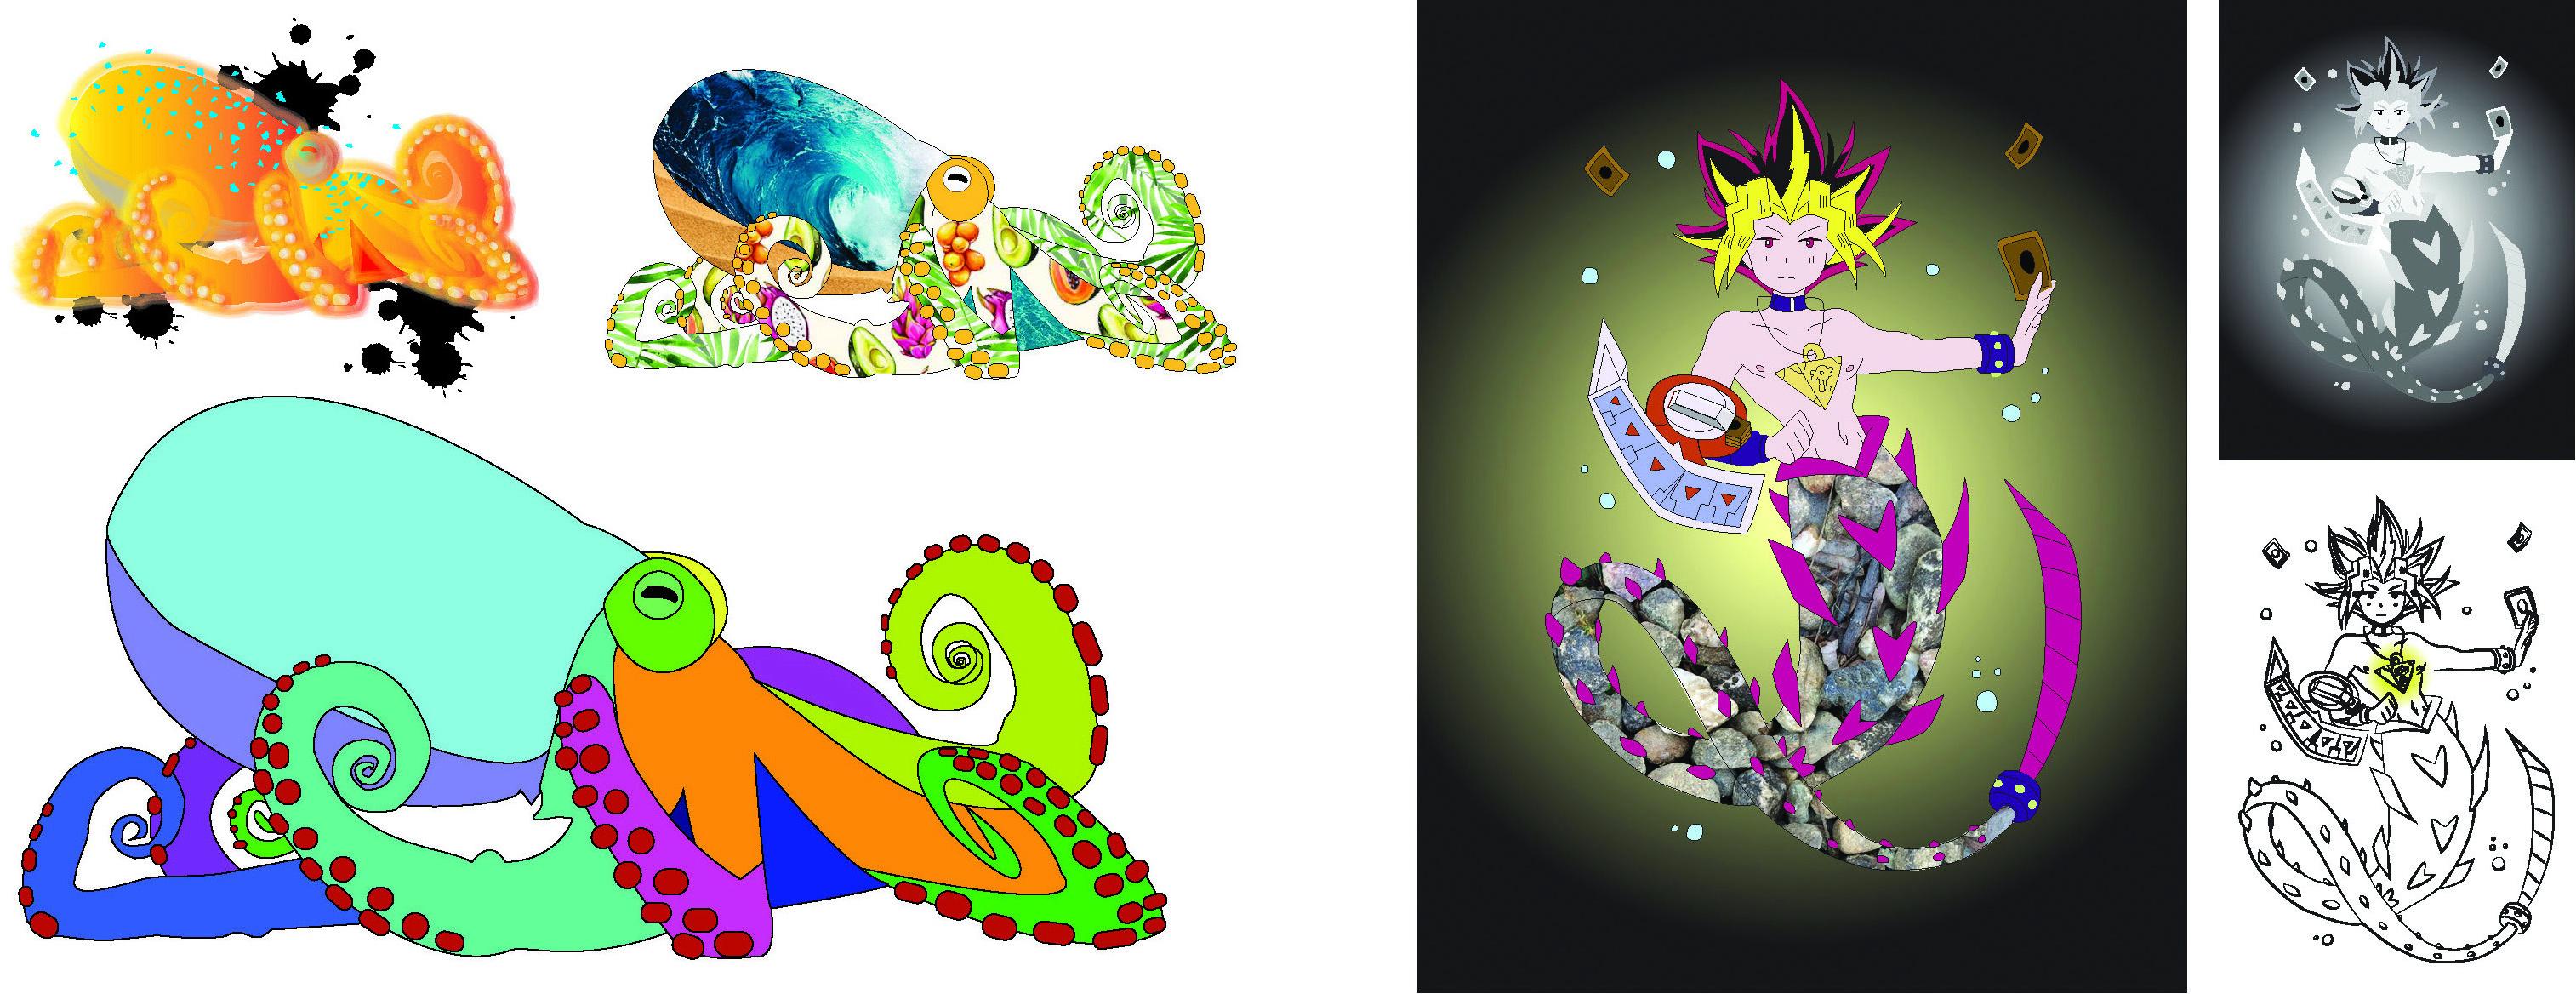 Illustration Drawing Series